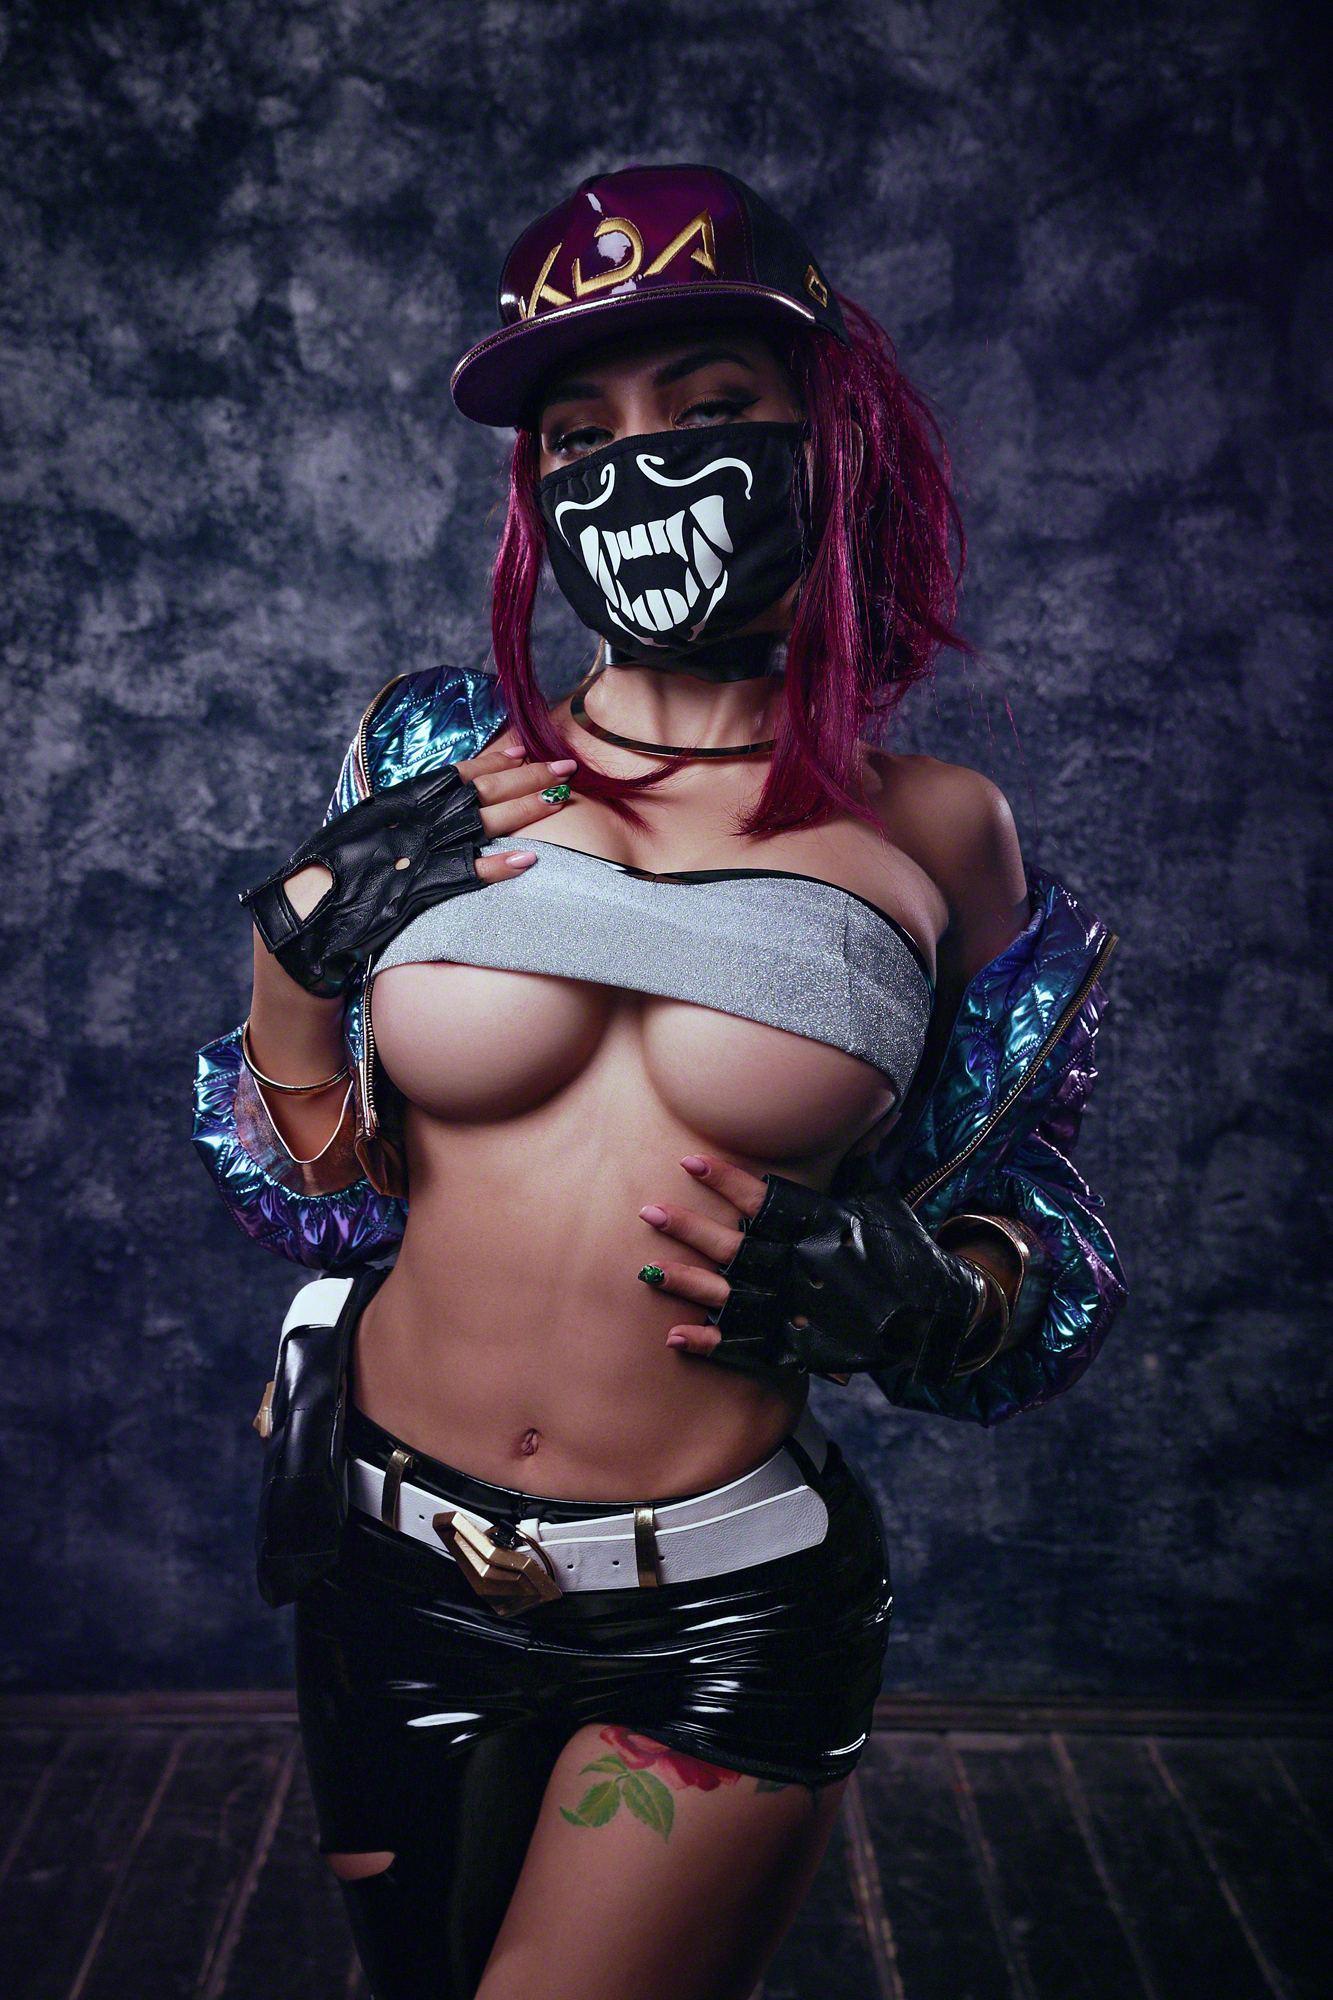 Kalinka Fox Nude Akali Cosplay Leaked 31